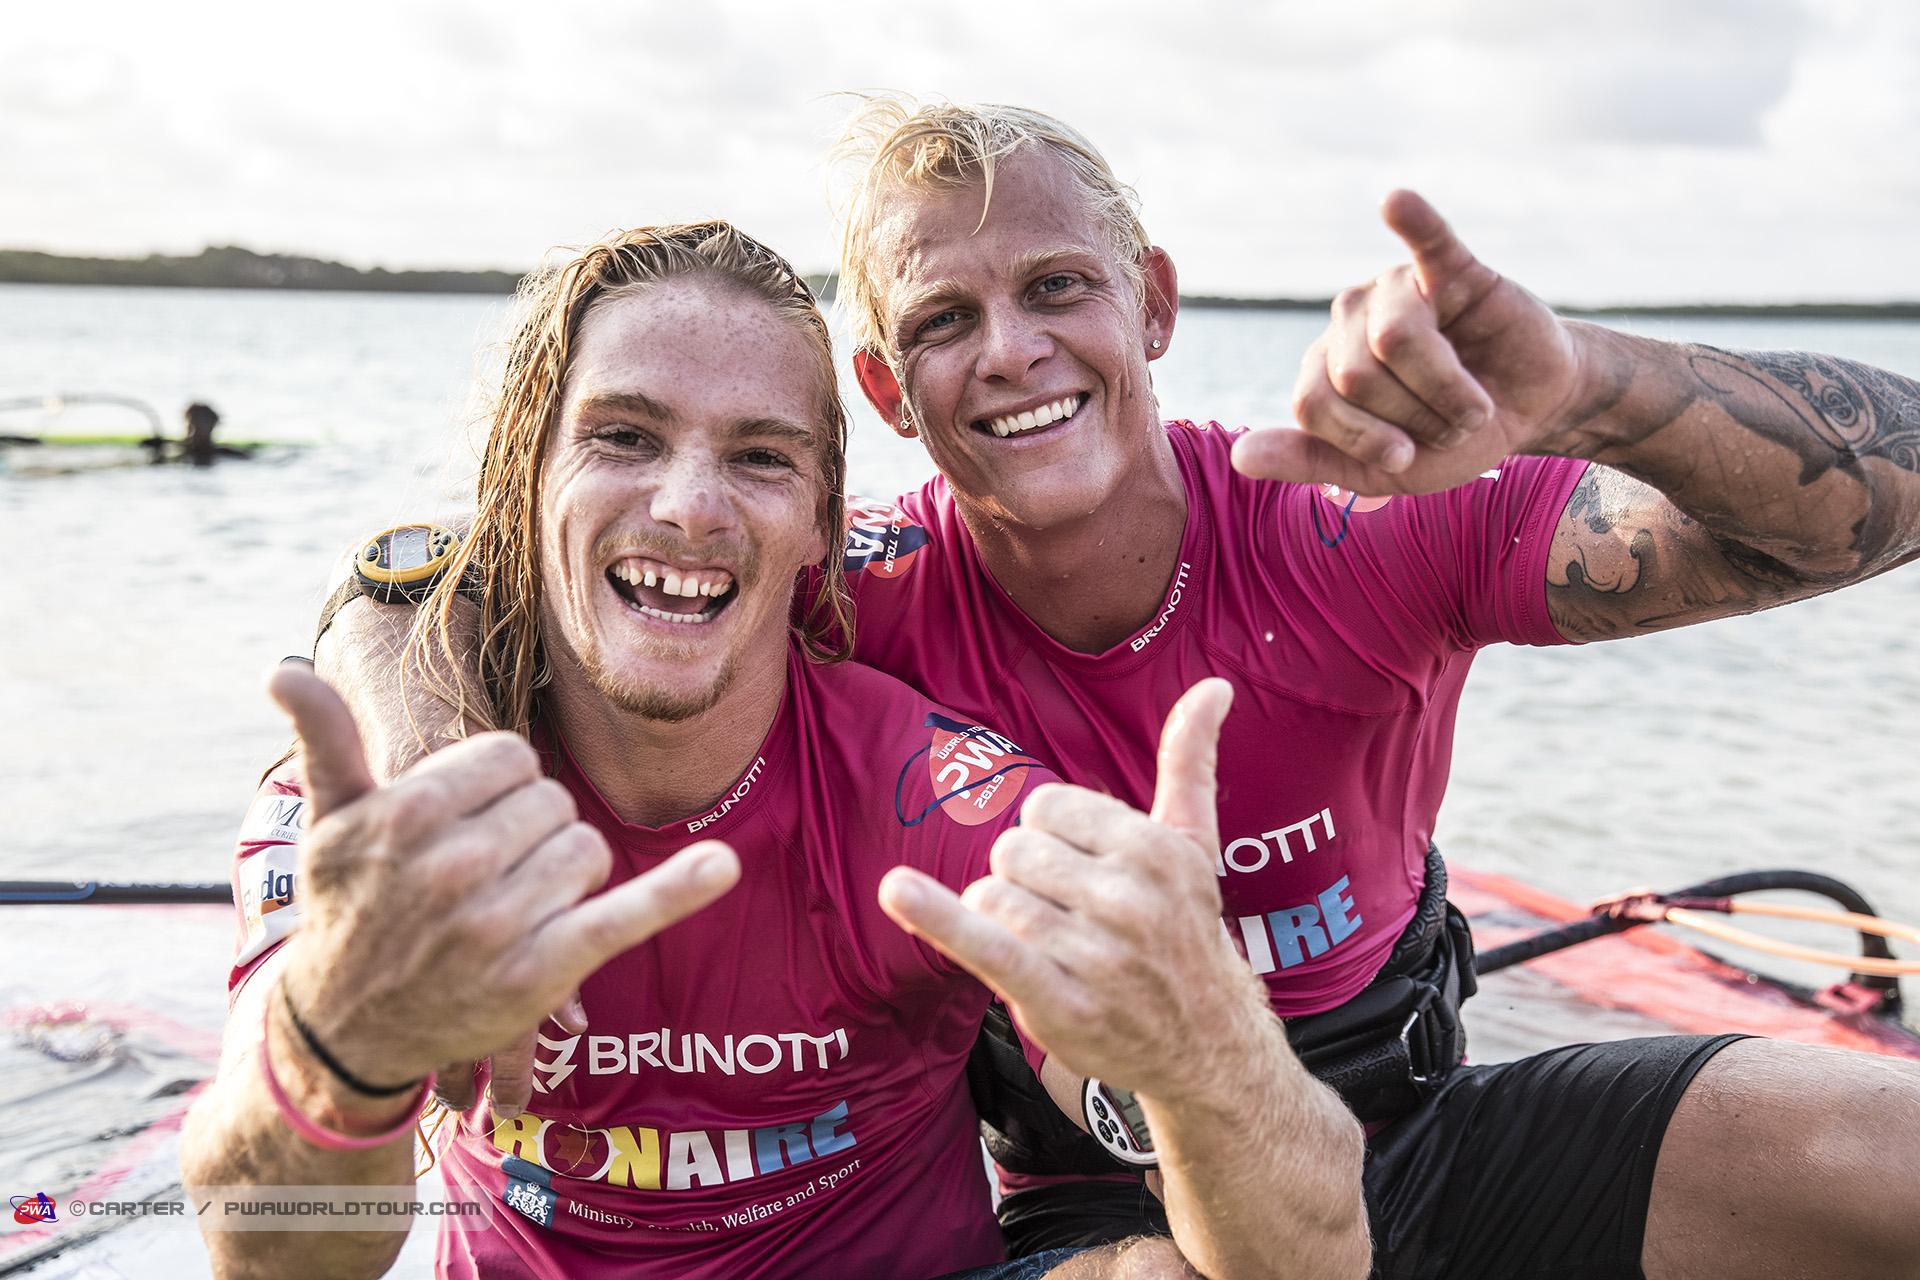 Youp Schmit & Amado Vrieswijk after their epic showdown